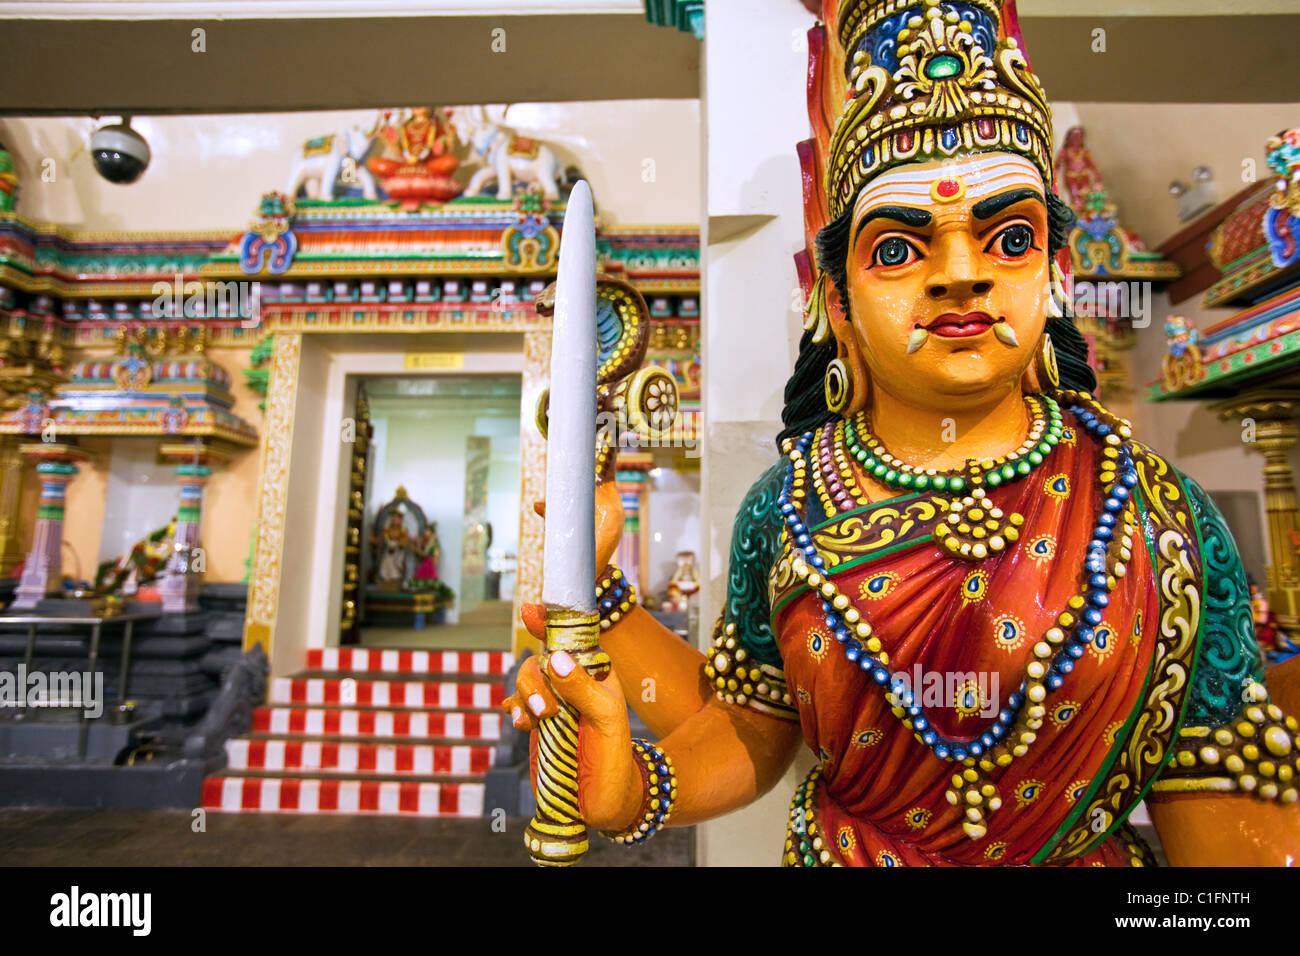 Hindu guardian at the Sri Mariamman Temple.  Chinatown, Singapore - Stock Image